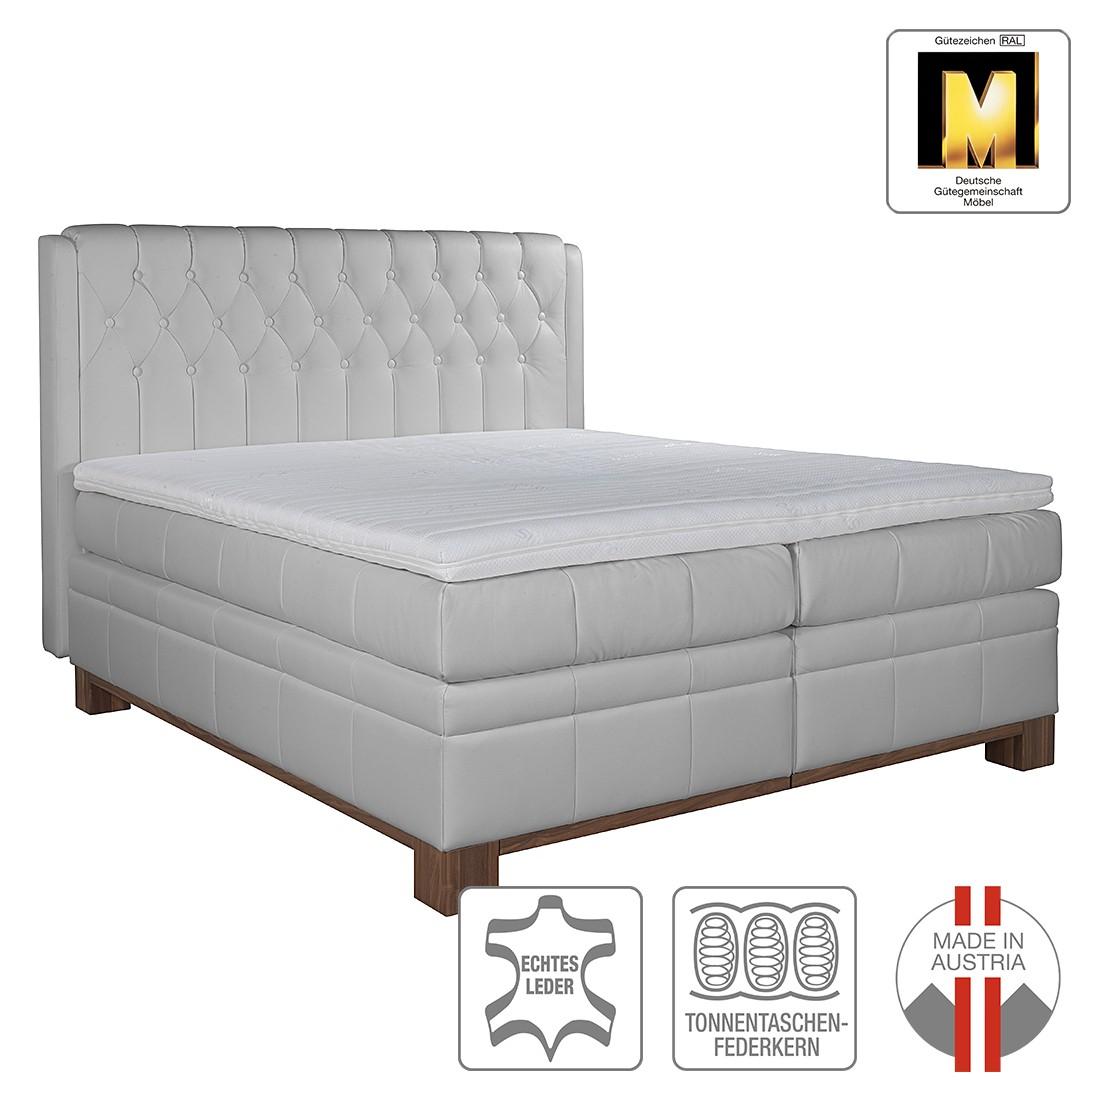 boxspringbett wellington 160 x 200cm h2 bis 80 kg grau ada premium jetzt kaufen. Black Bedroom Furniture Sets. Home Design Ideas